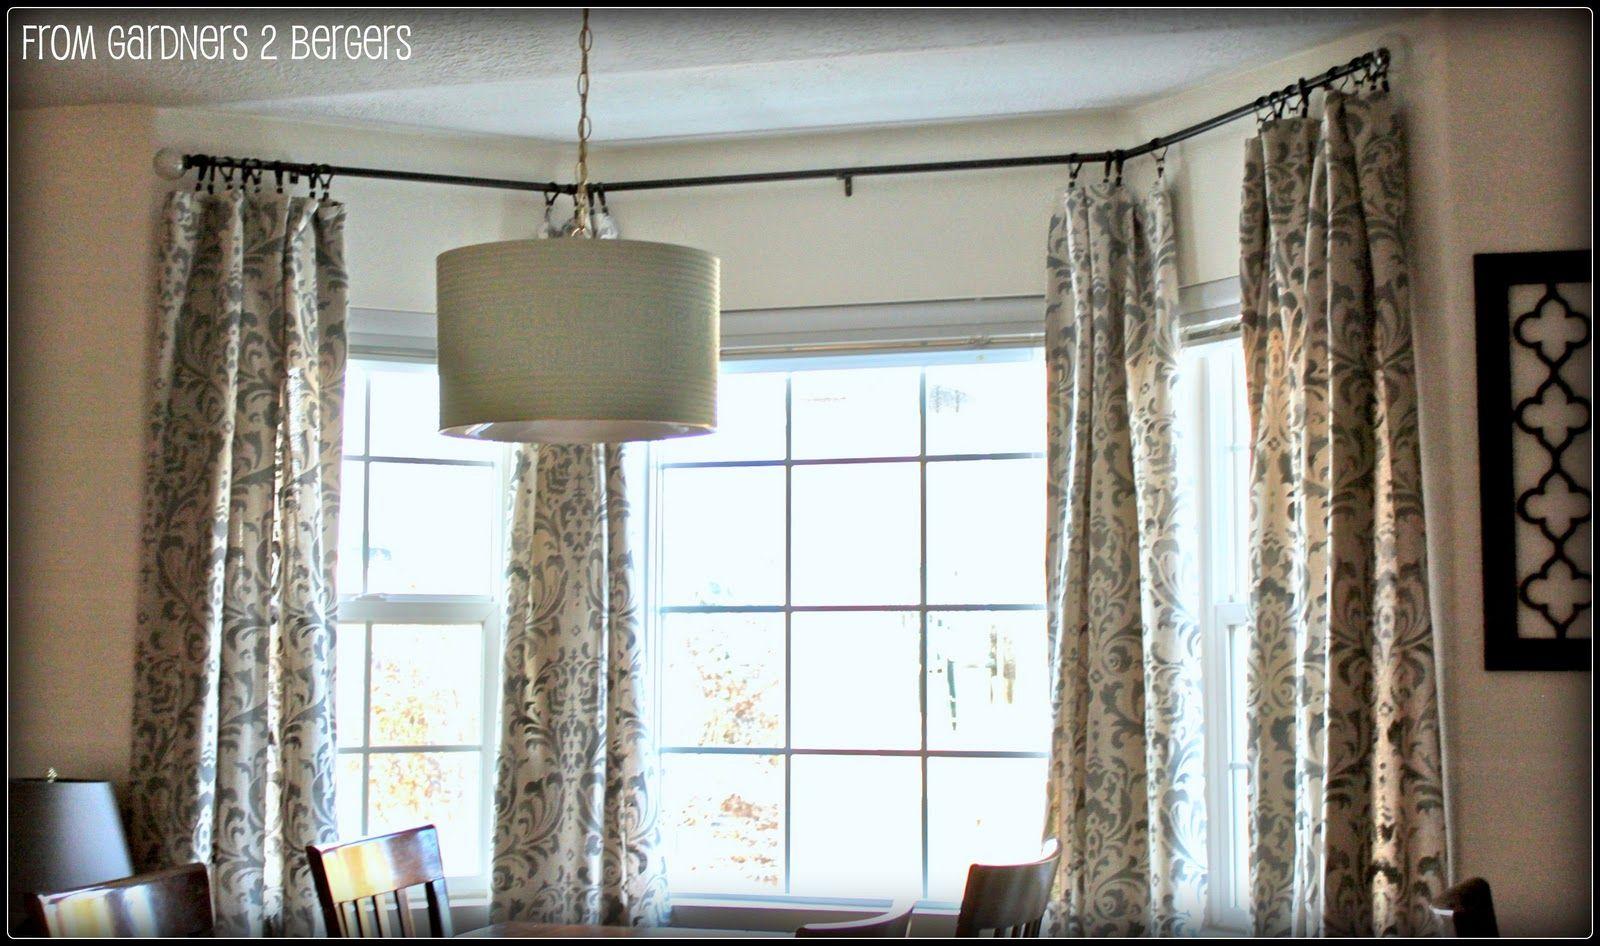 Diy Curtain Rods Sliding Glass Door Bay Window Diy Curtains Diy Curtain Rods Patio Door Coverings